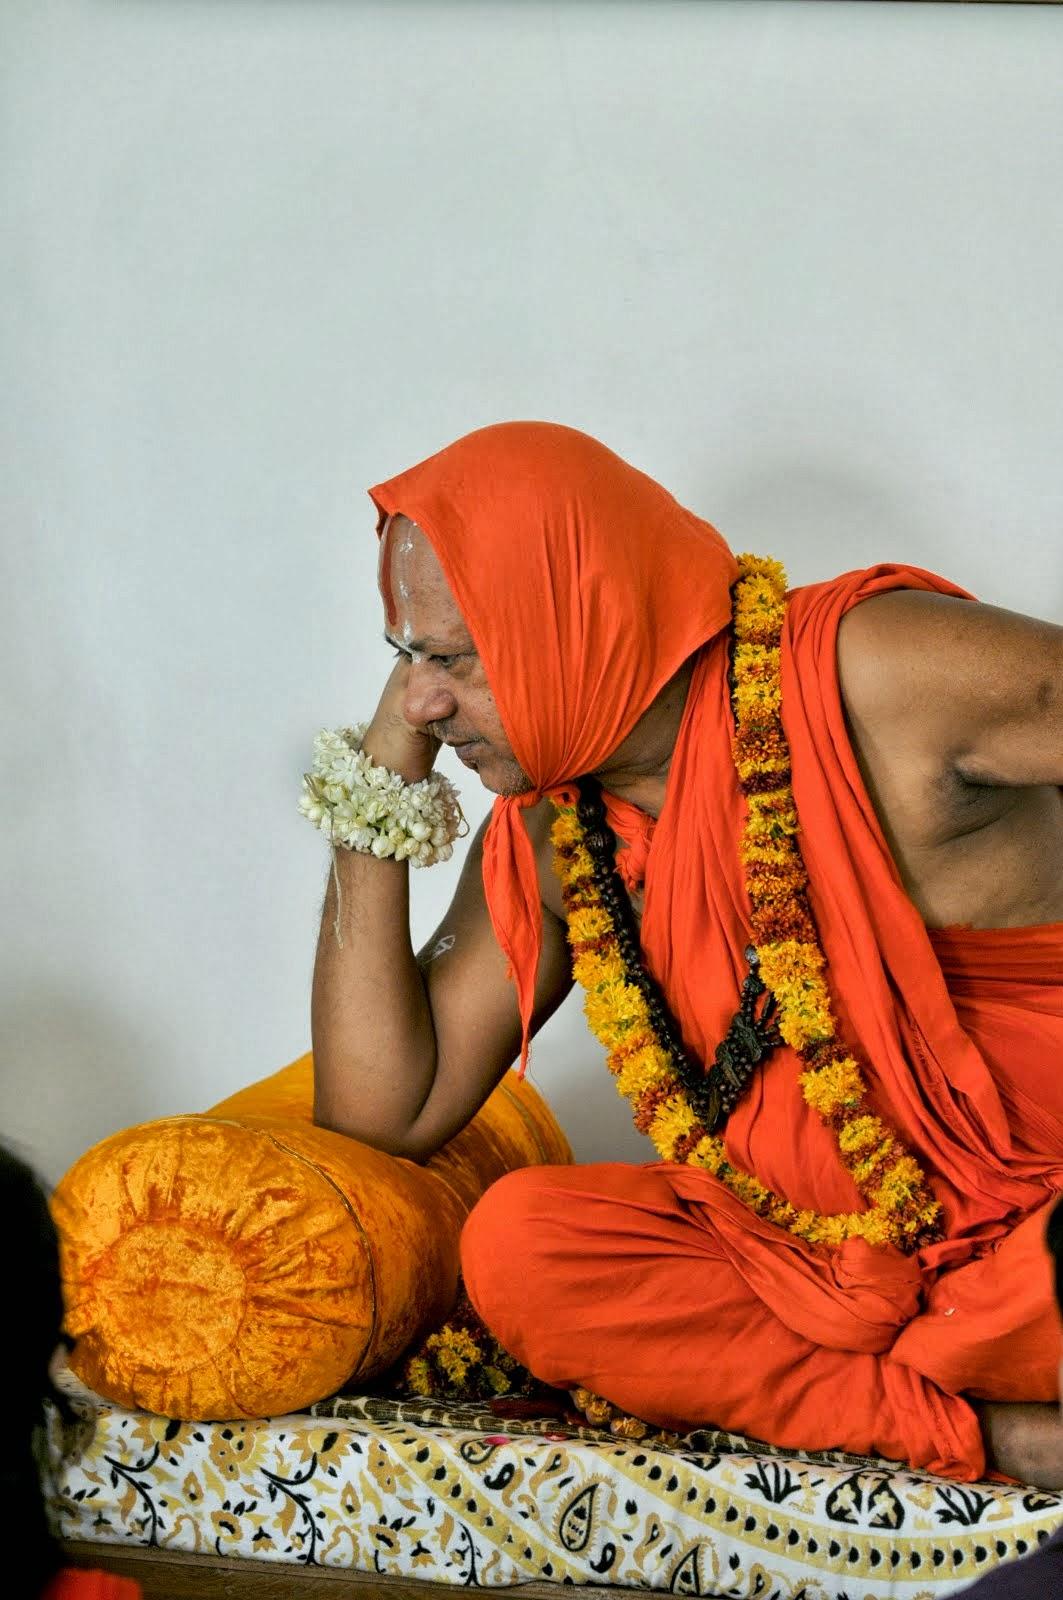 श्री राम जय राम जय जय राम